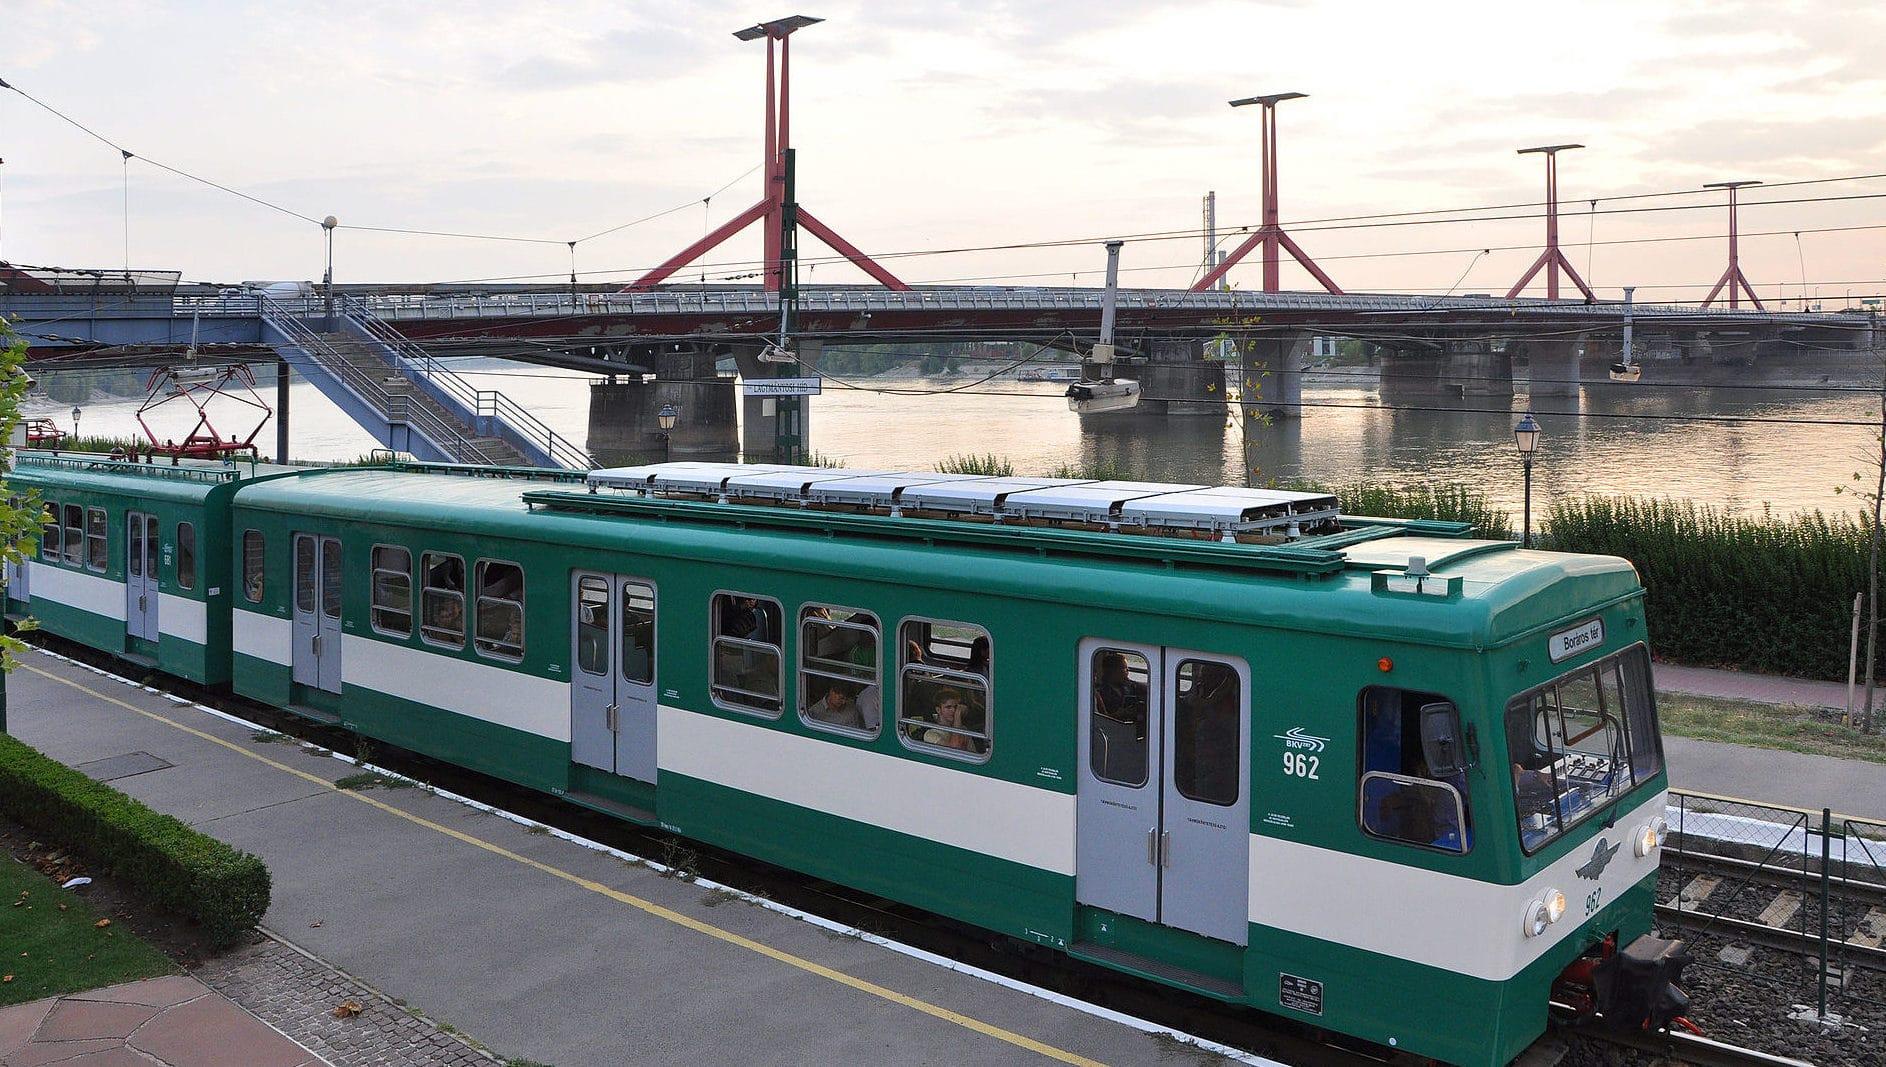 transports publics de budapest